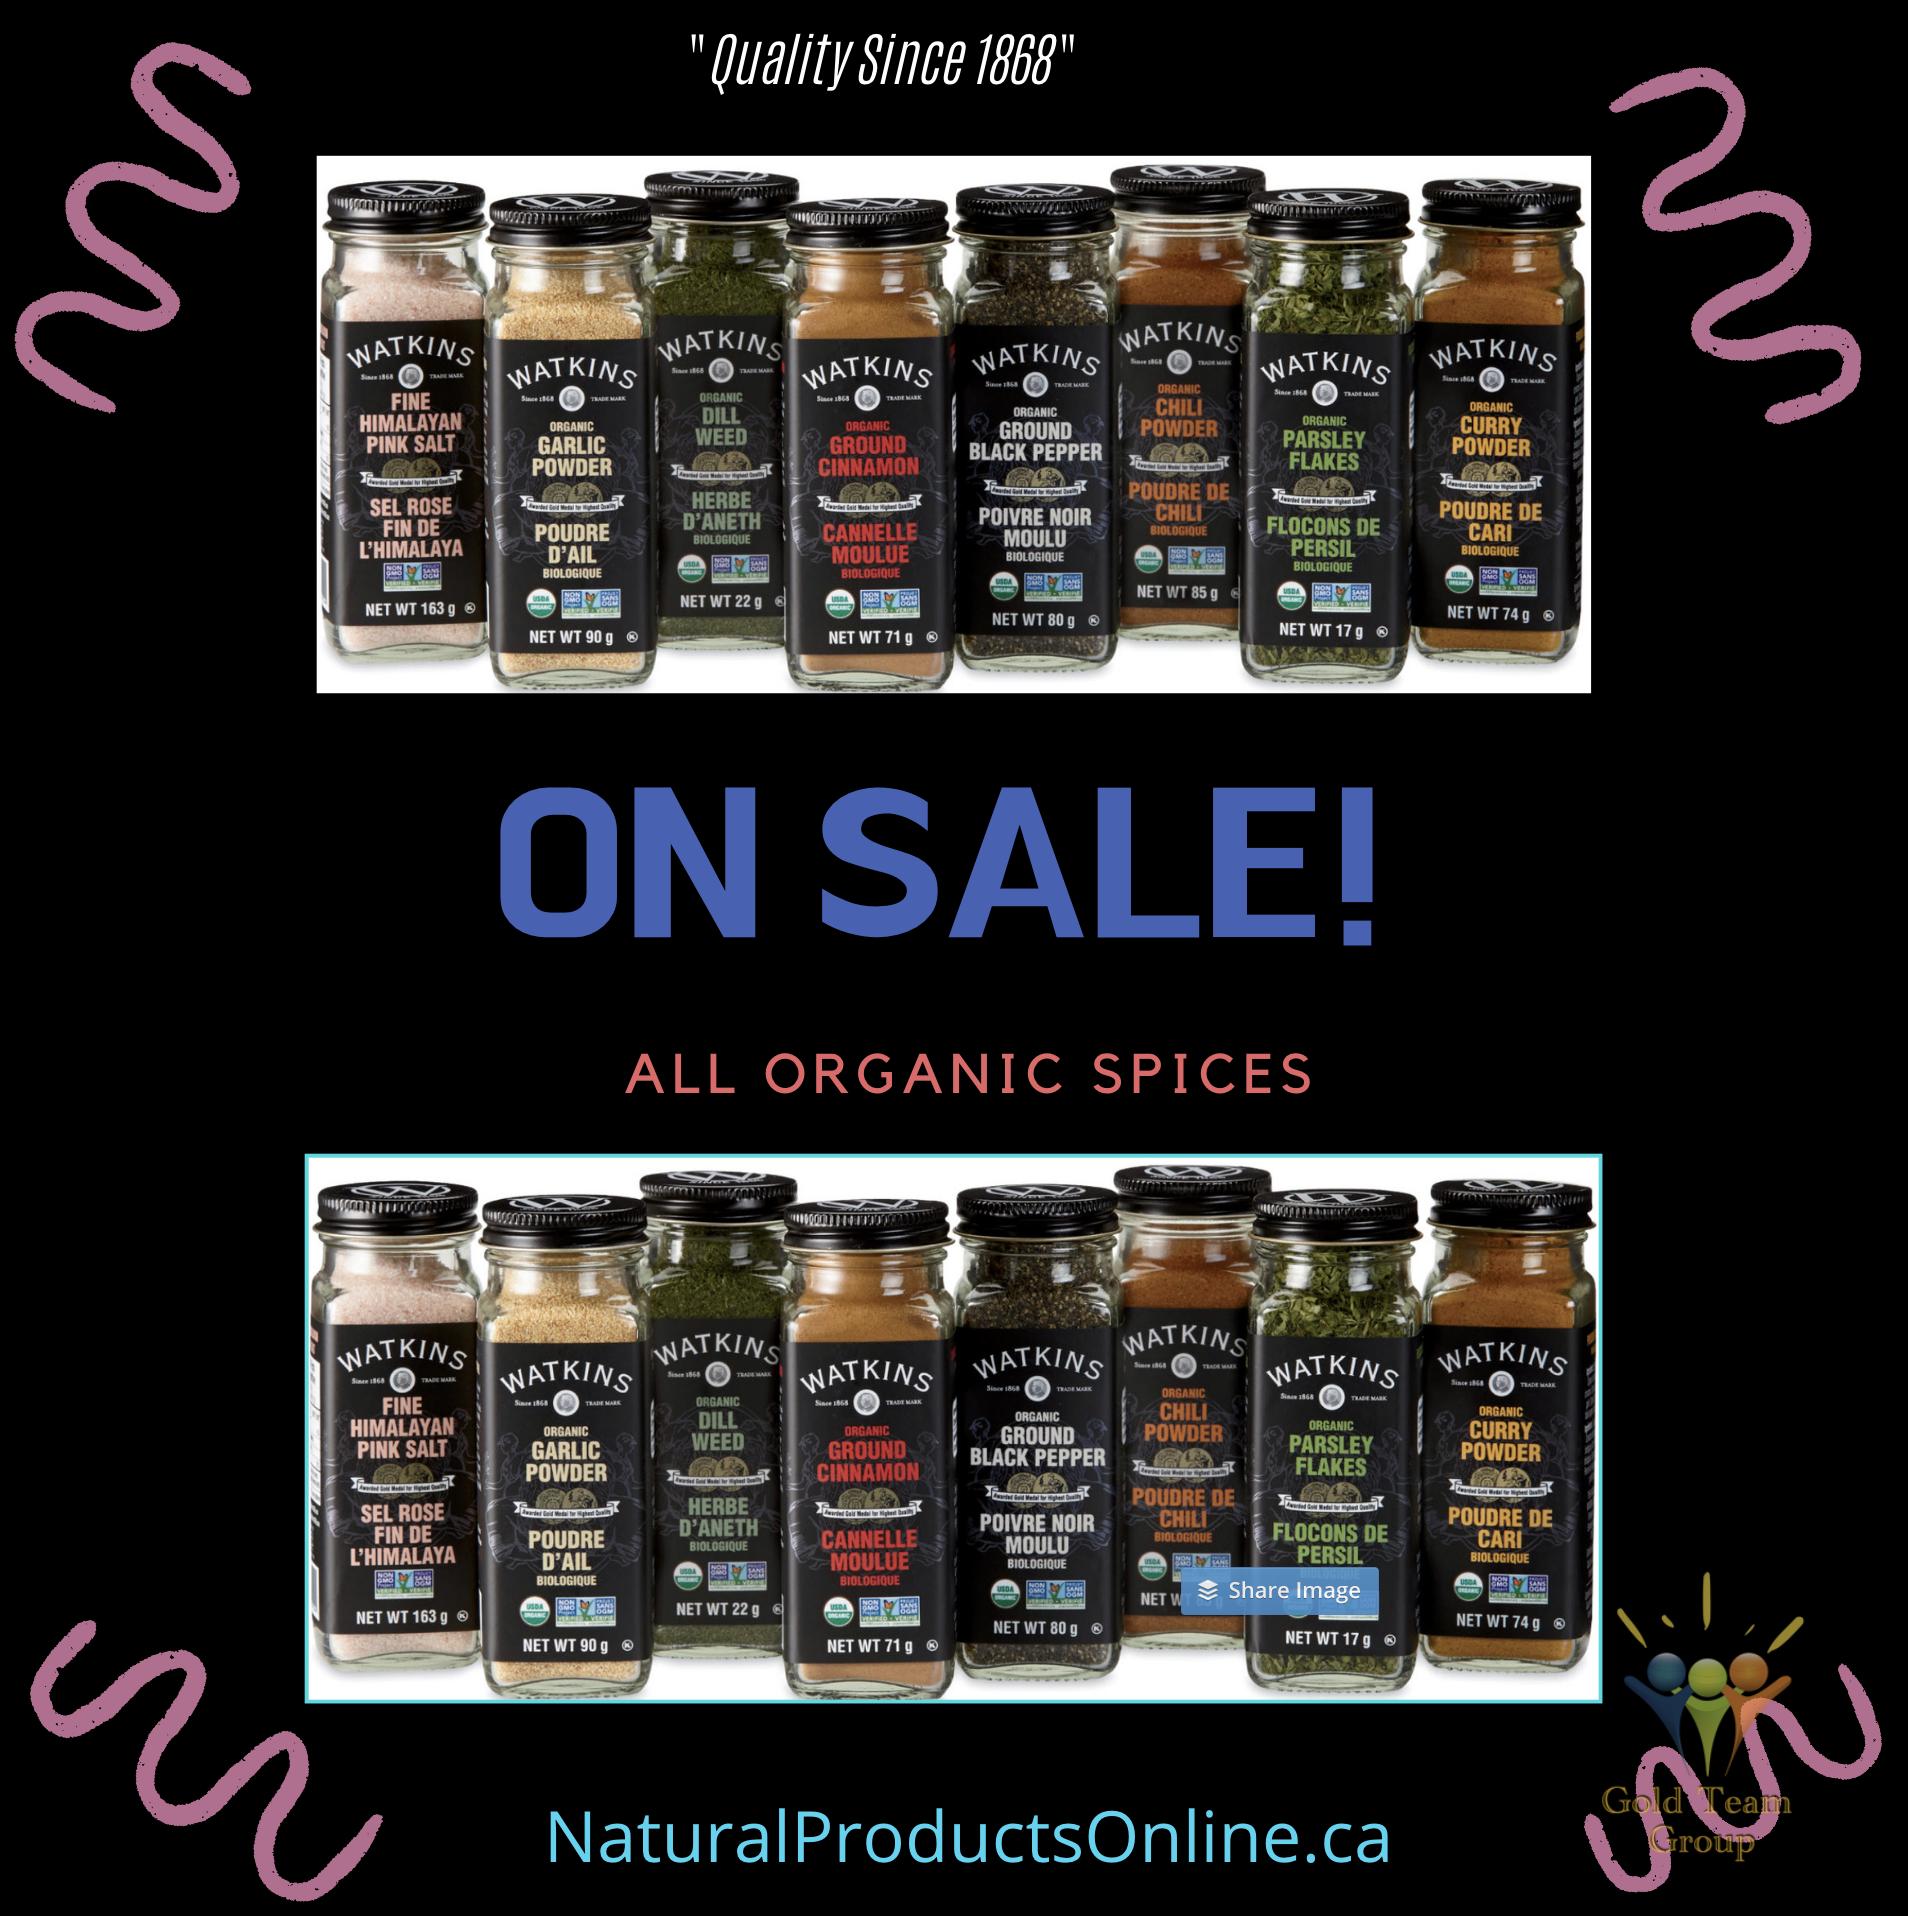 watkins organic spices on sale